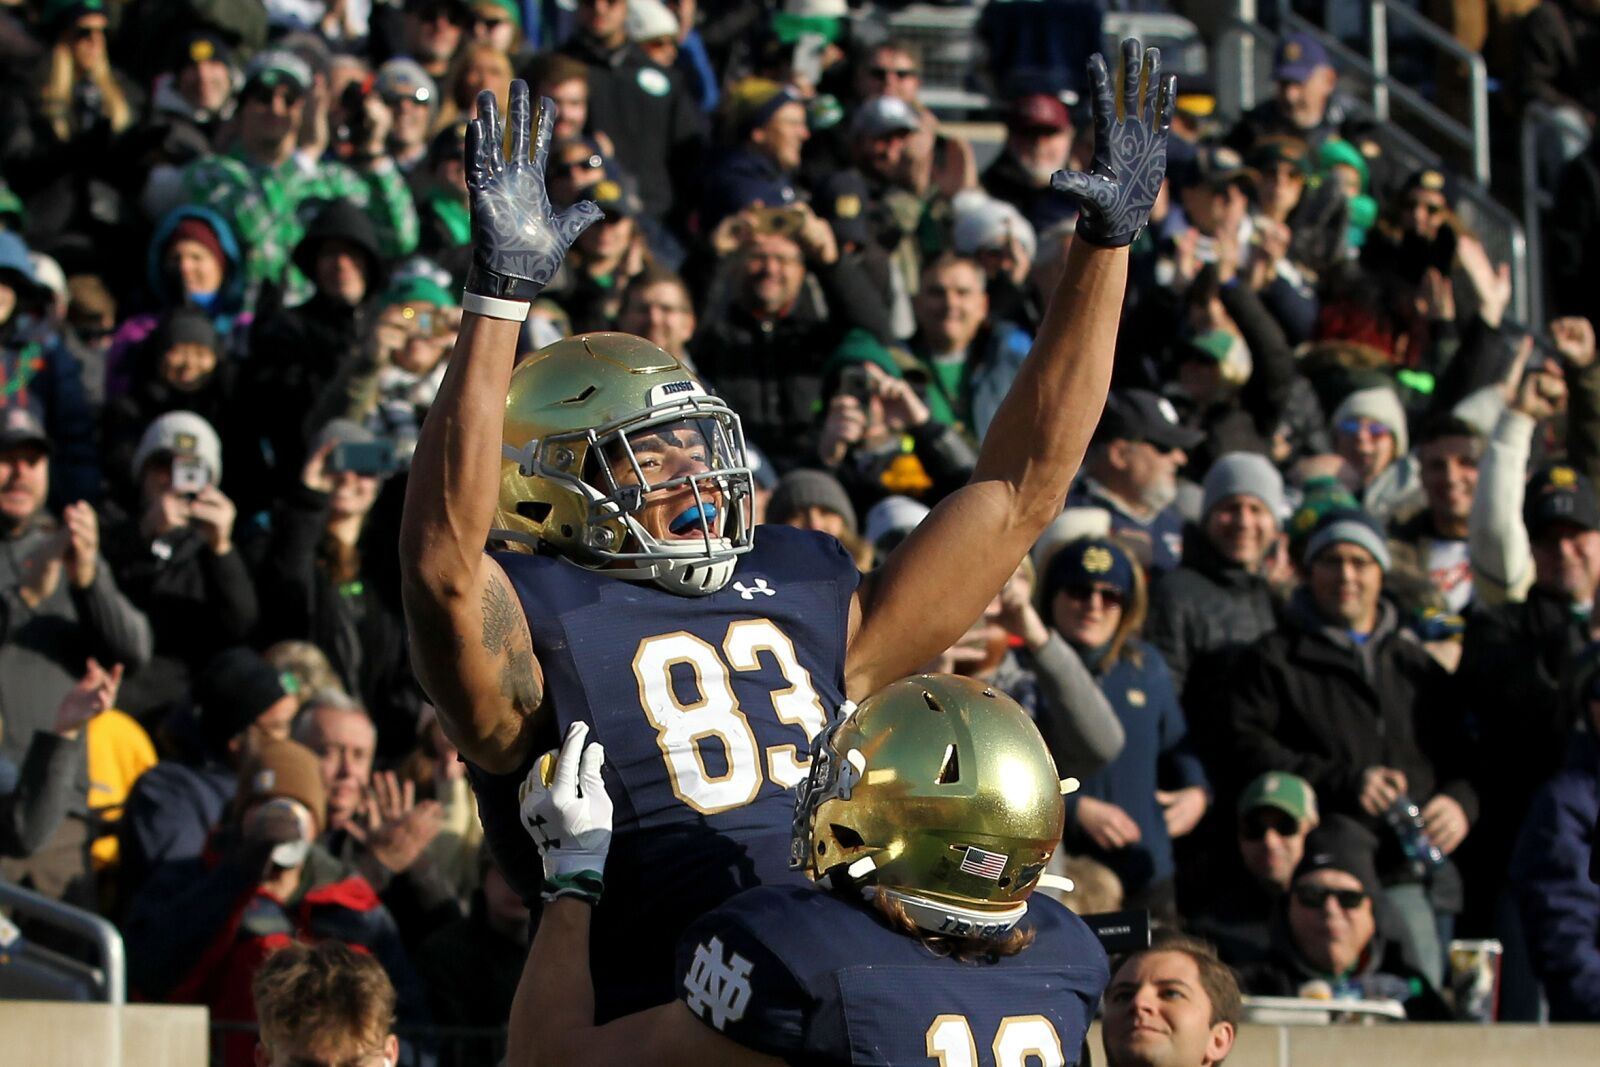 Notre Dame Football's End of Season Superlatives: Team MVP